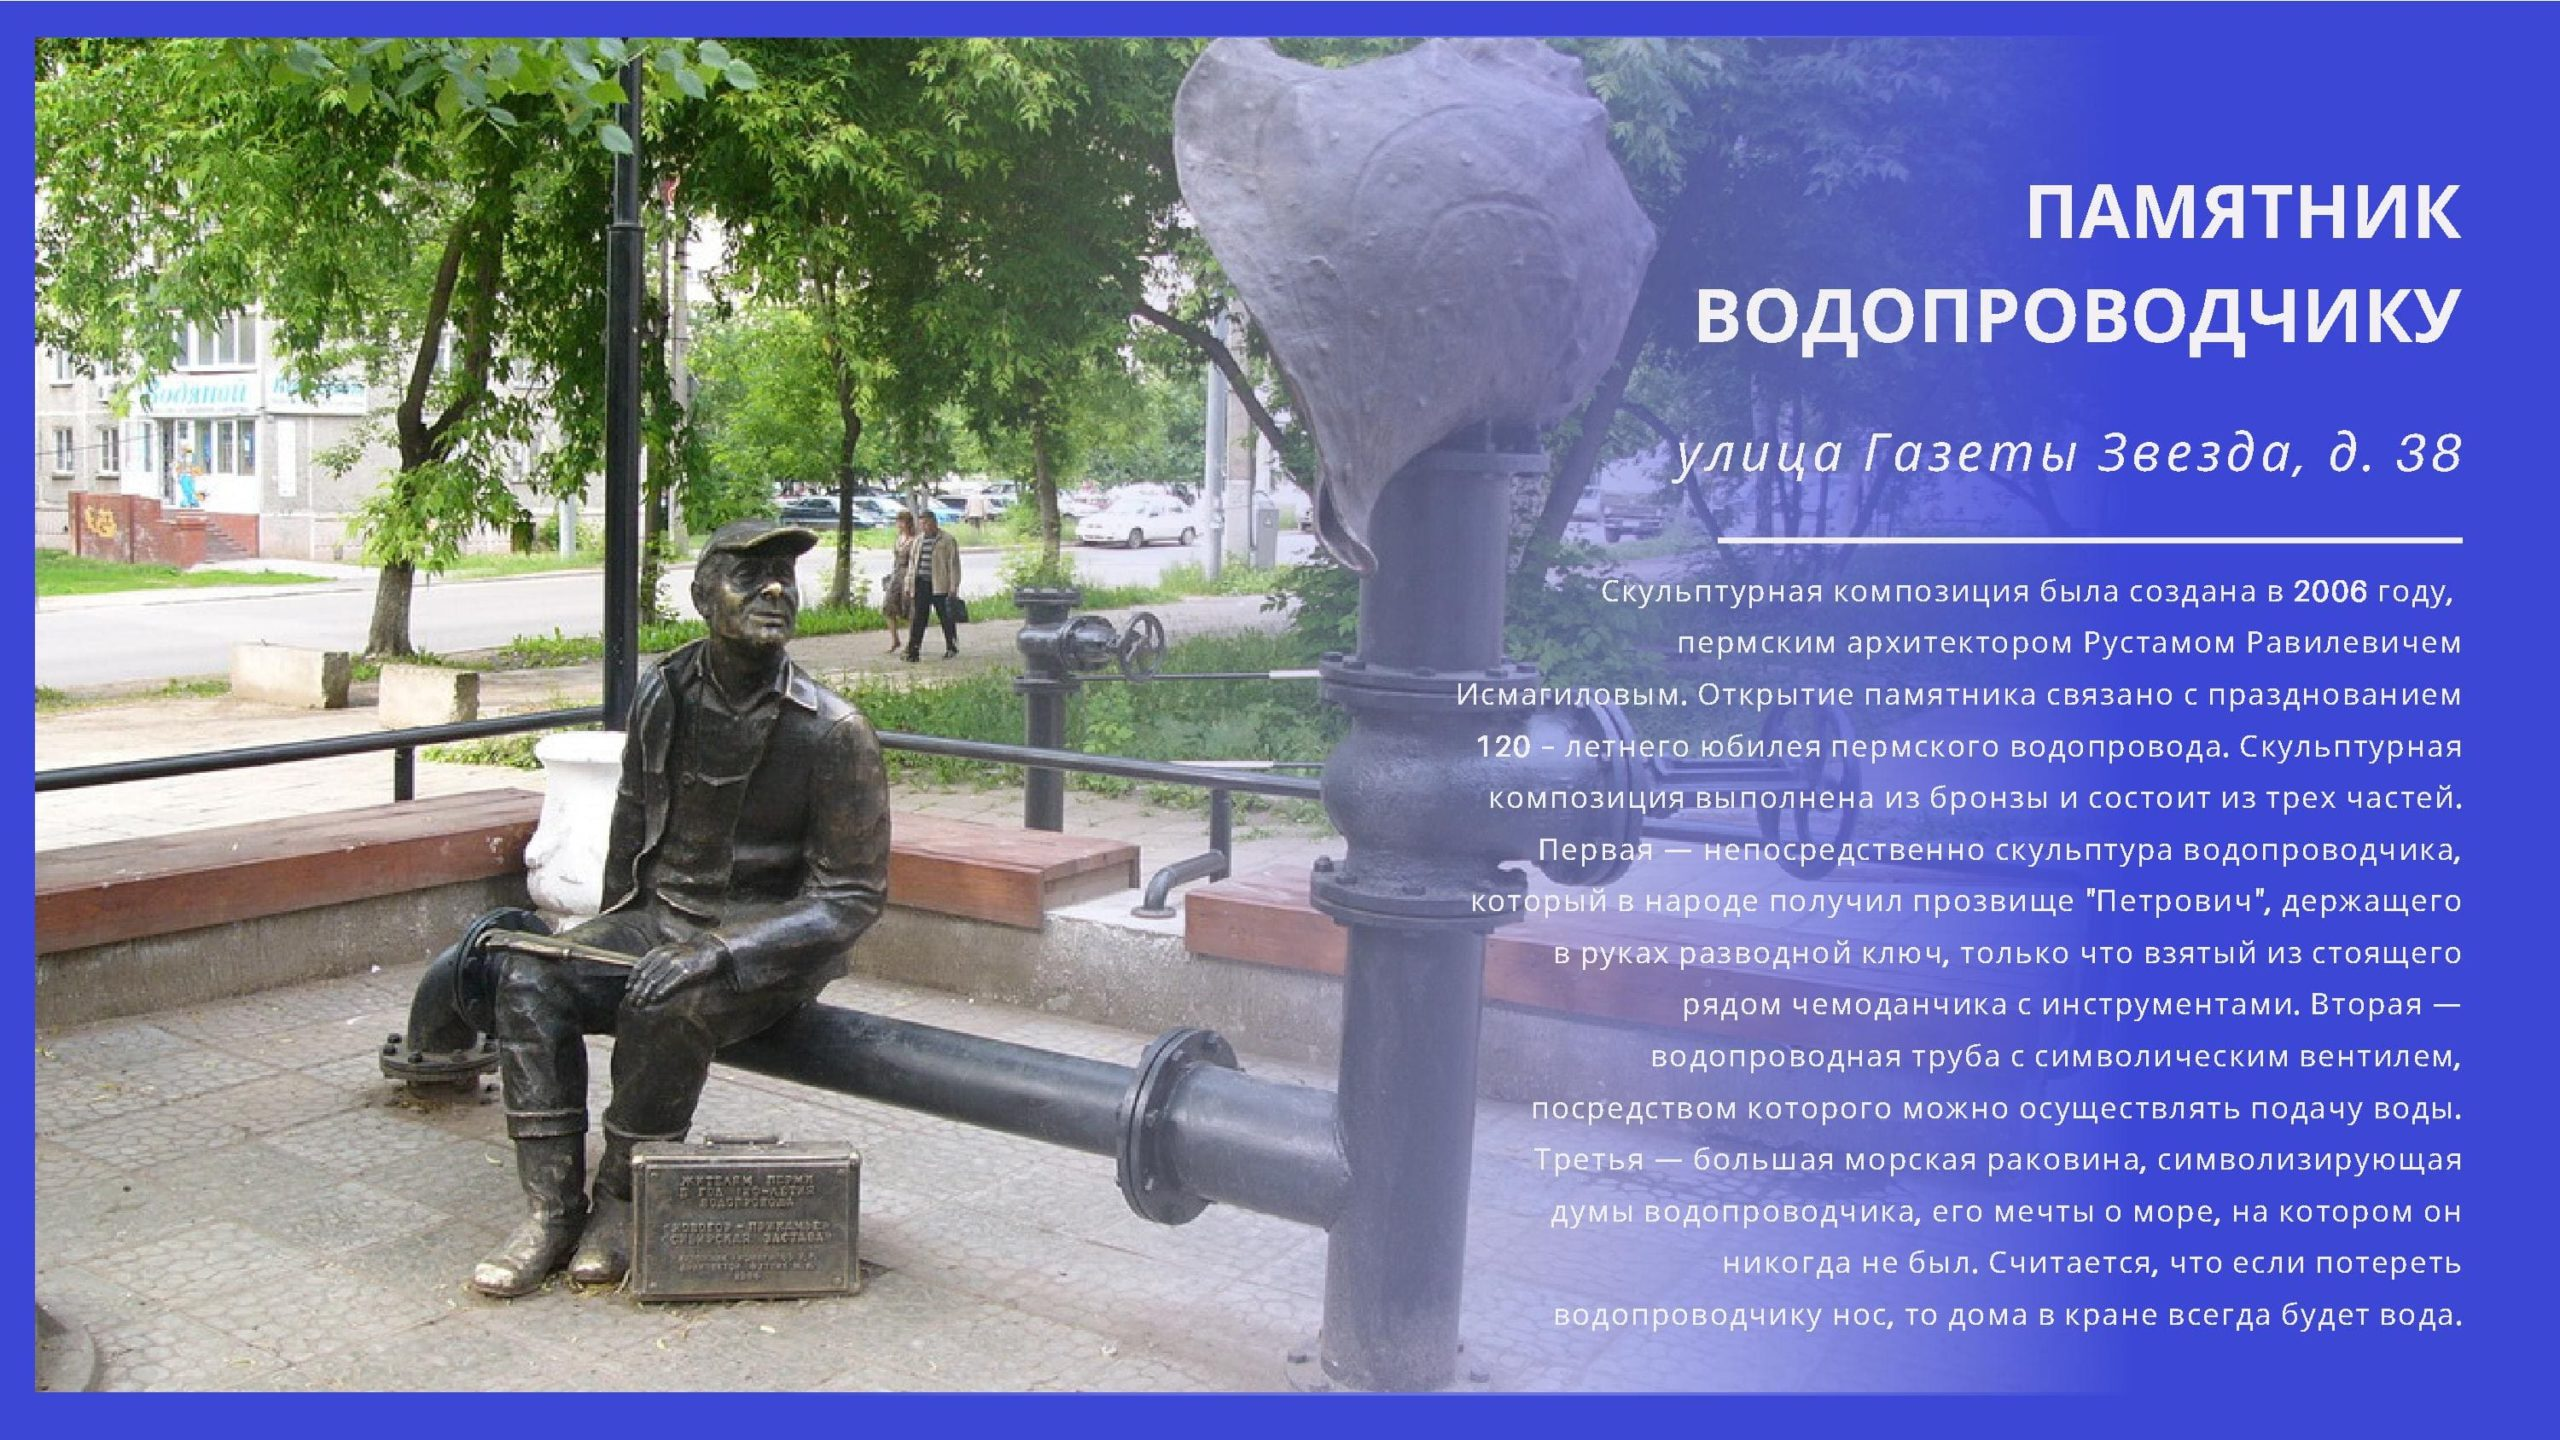 Памятник водопроводчику. Улица Газеты Звезда, д. 38